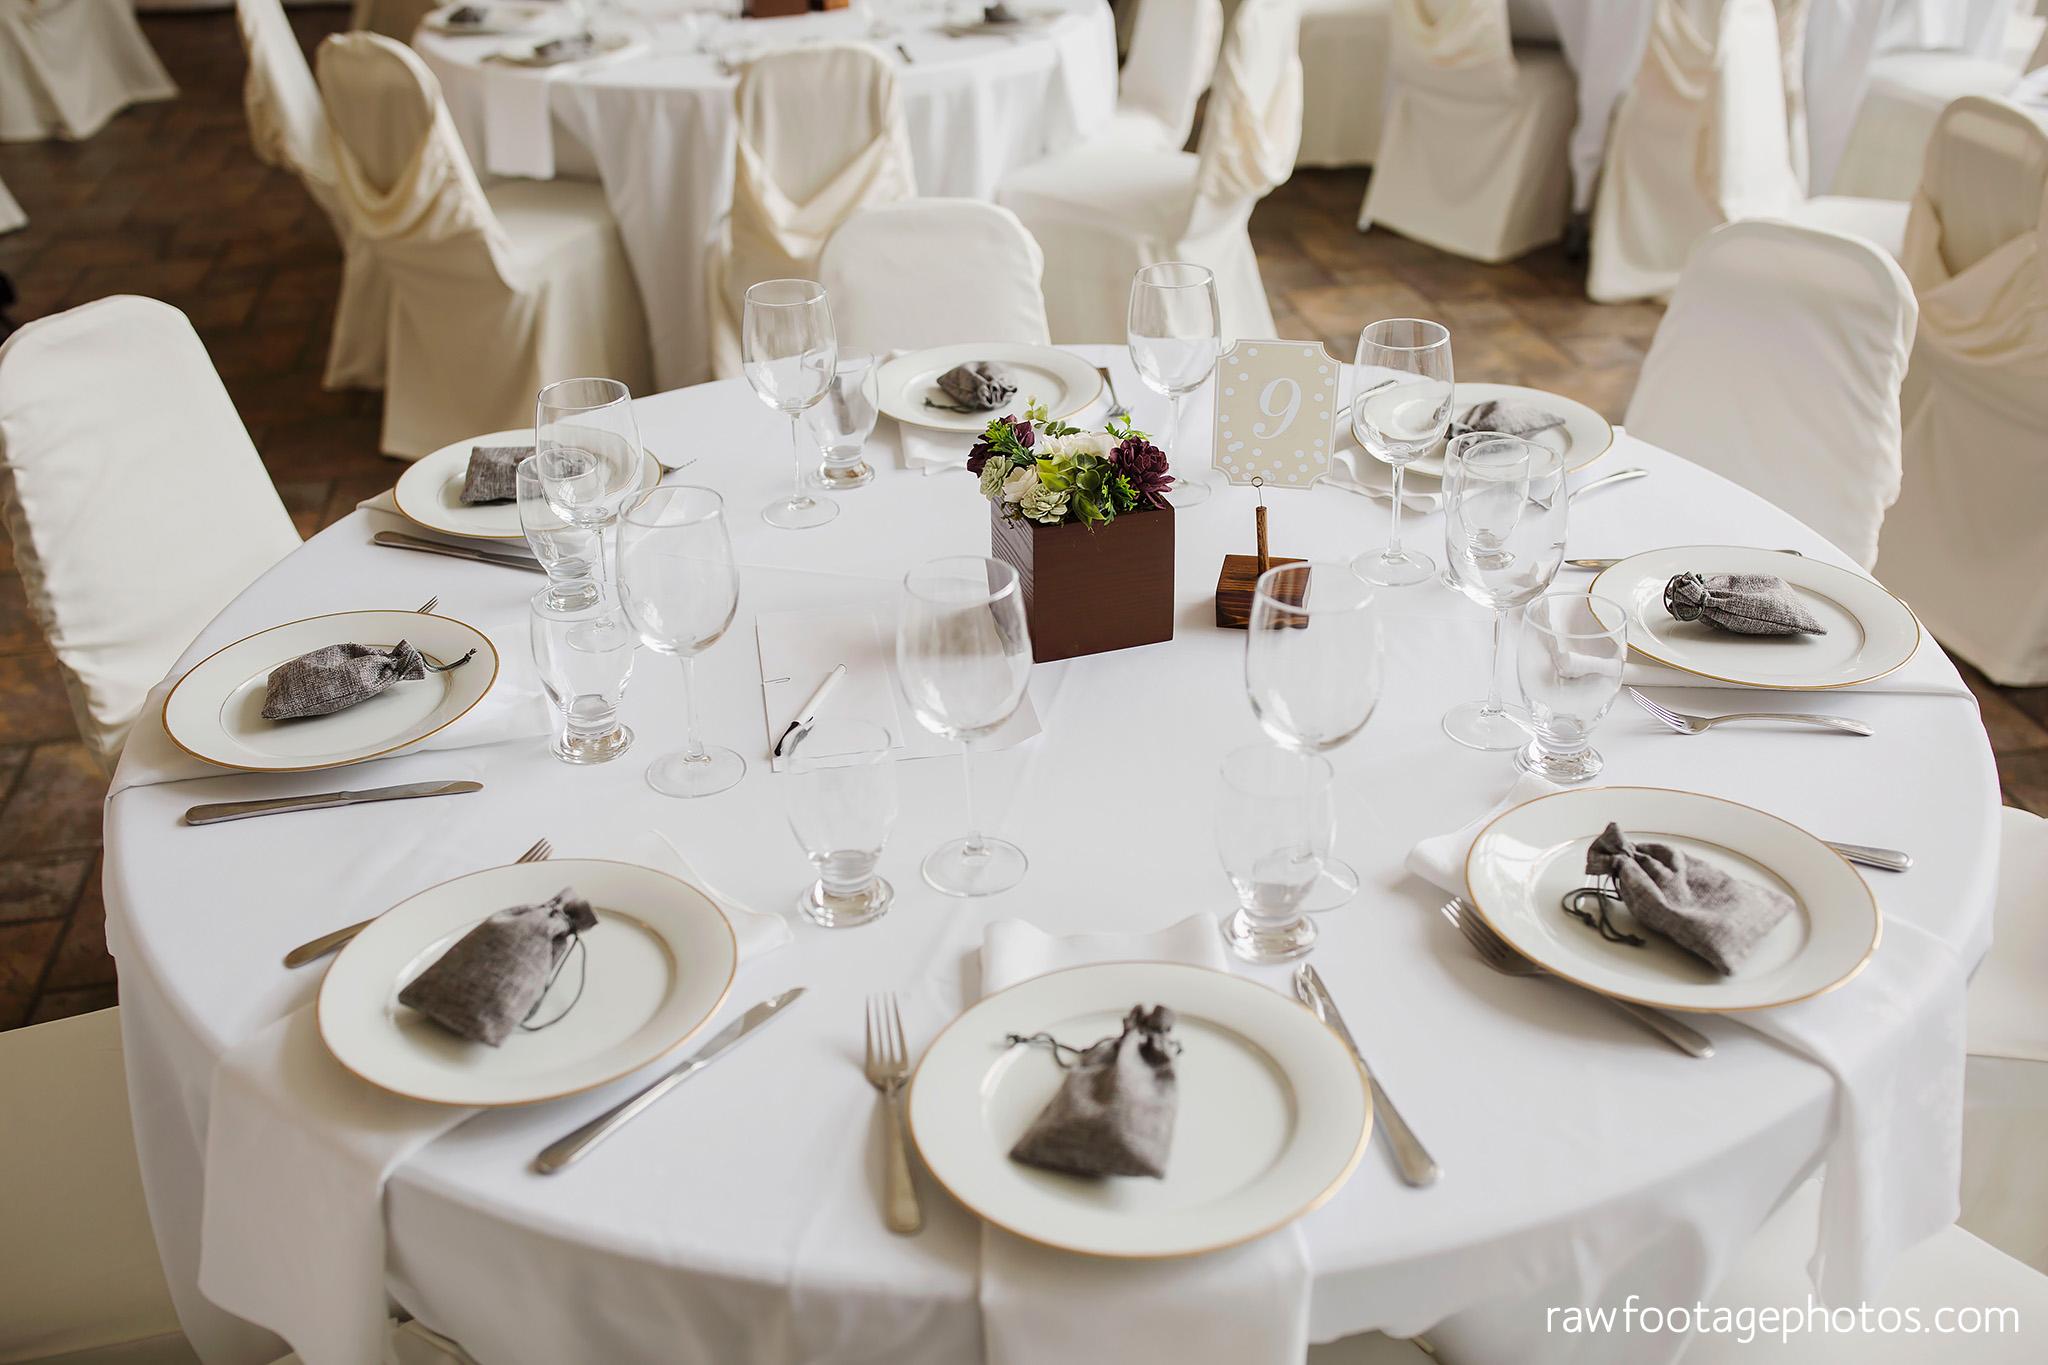 london_ontario_wedding_photographer-civic_gardens-springbank_park-succulent_bouquet-fall_wedding-bridge-raw_footage_photography032.jpg